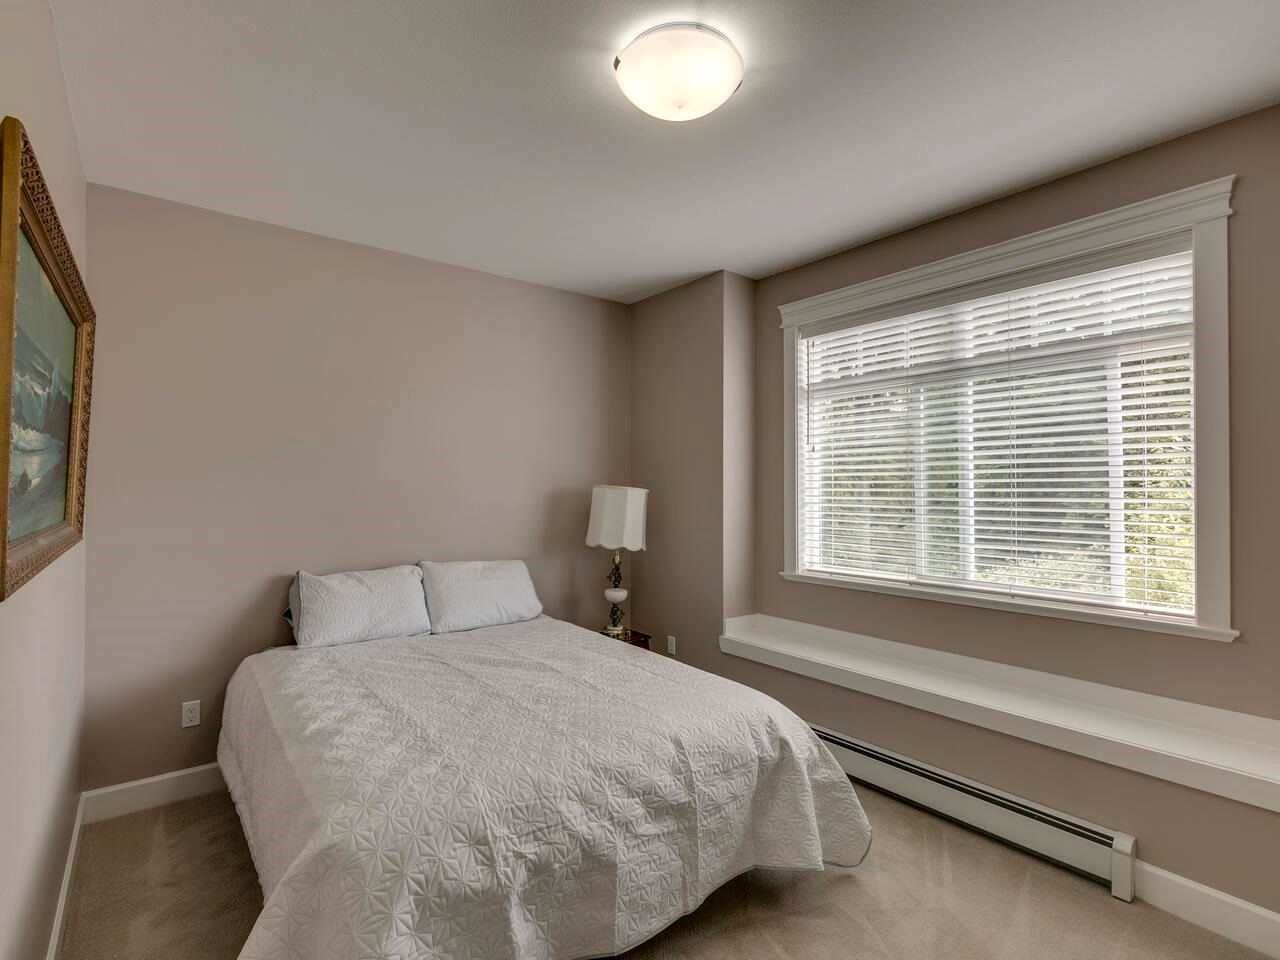 "Photo 22: Photos: 22845 126B Avenue in Maple Ridge: East Central House for sale in ""EAST CENTRAL MAPLE RIDGE"" : MLS®# R2594638"